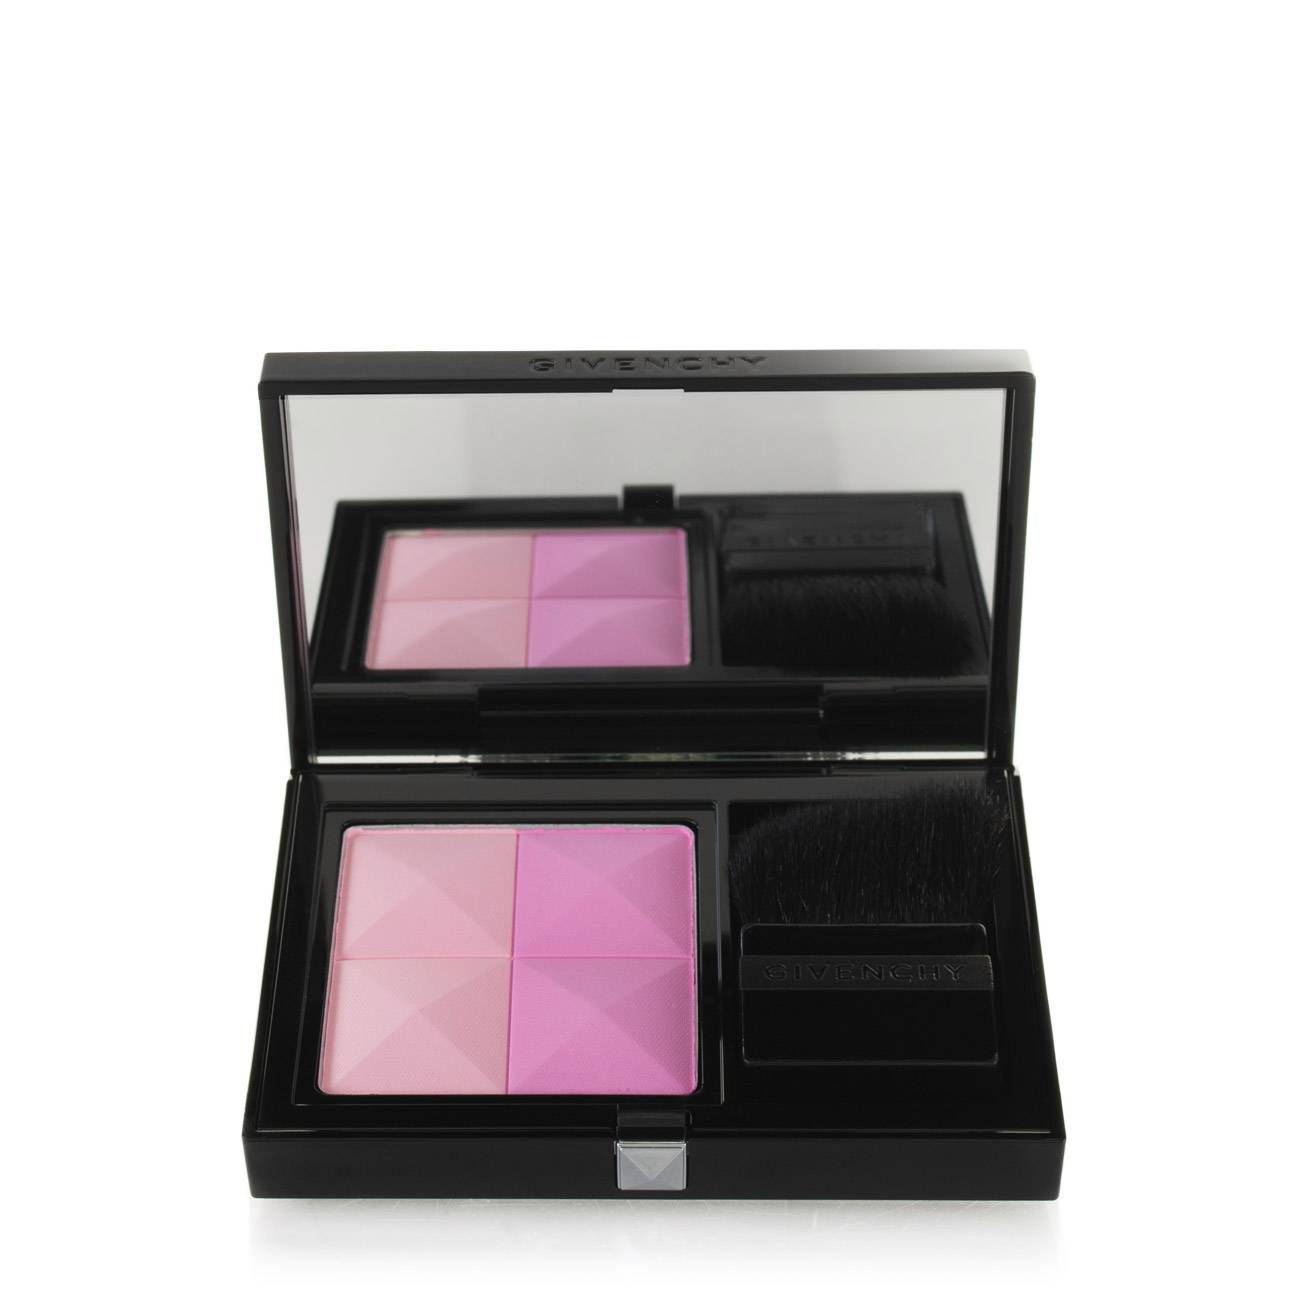 Le Prisme Blush Love 02 Givenchy imagine 2021 bestvalue.eu